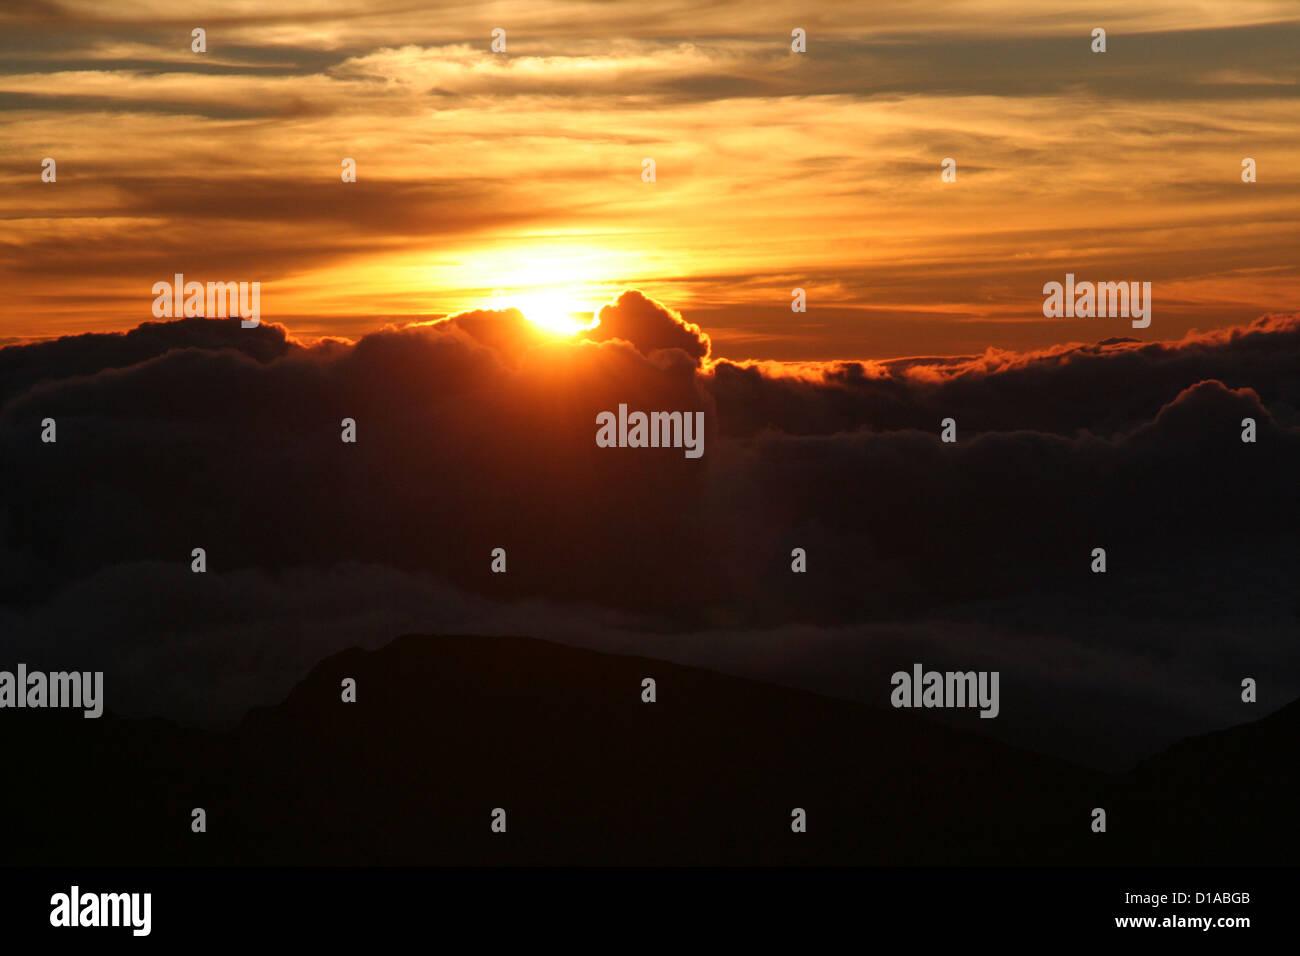 Golden sunrise from Haleakala volcano, Maui, Hawaii Stock Photo